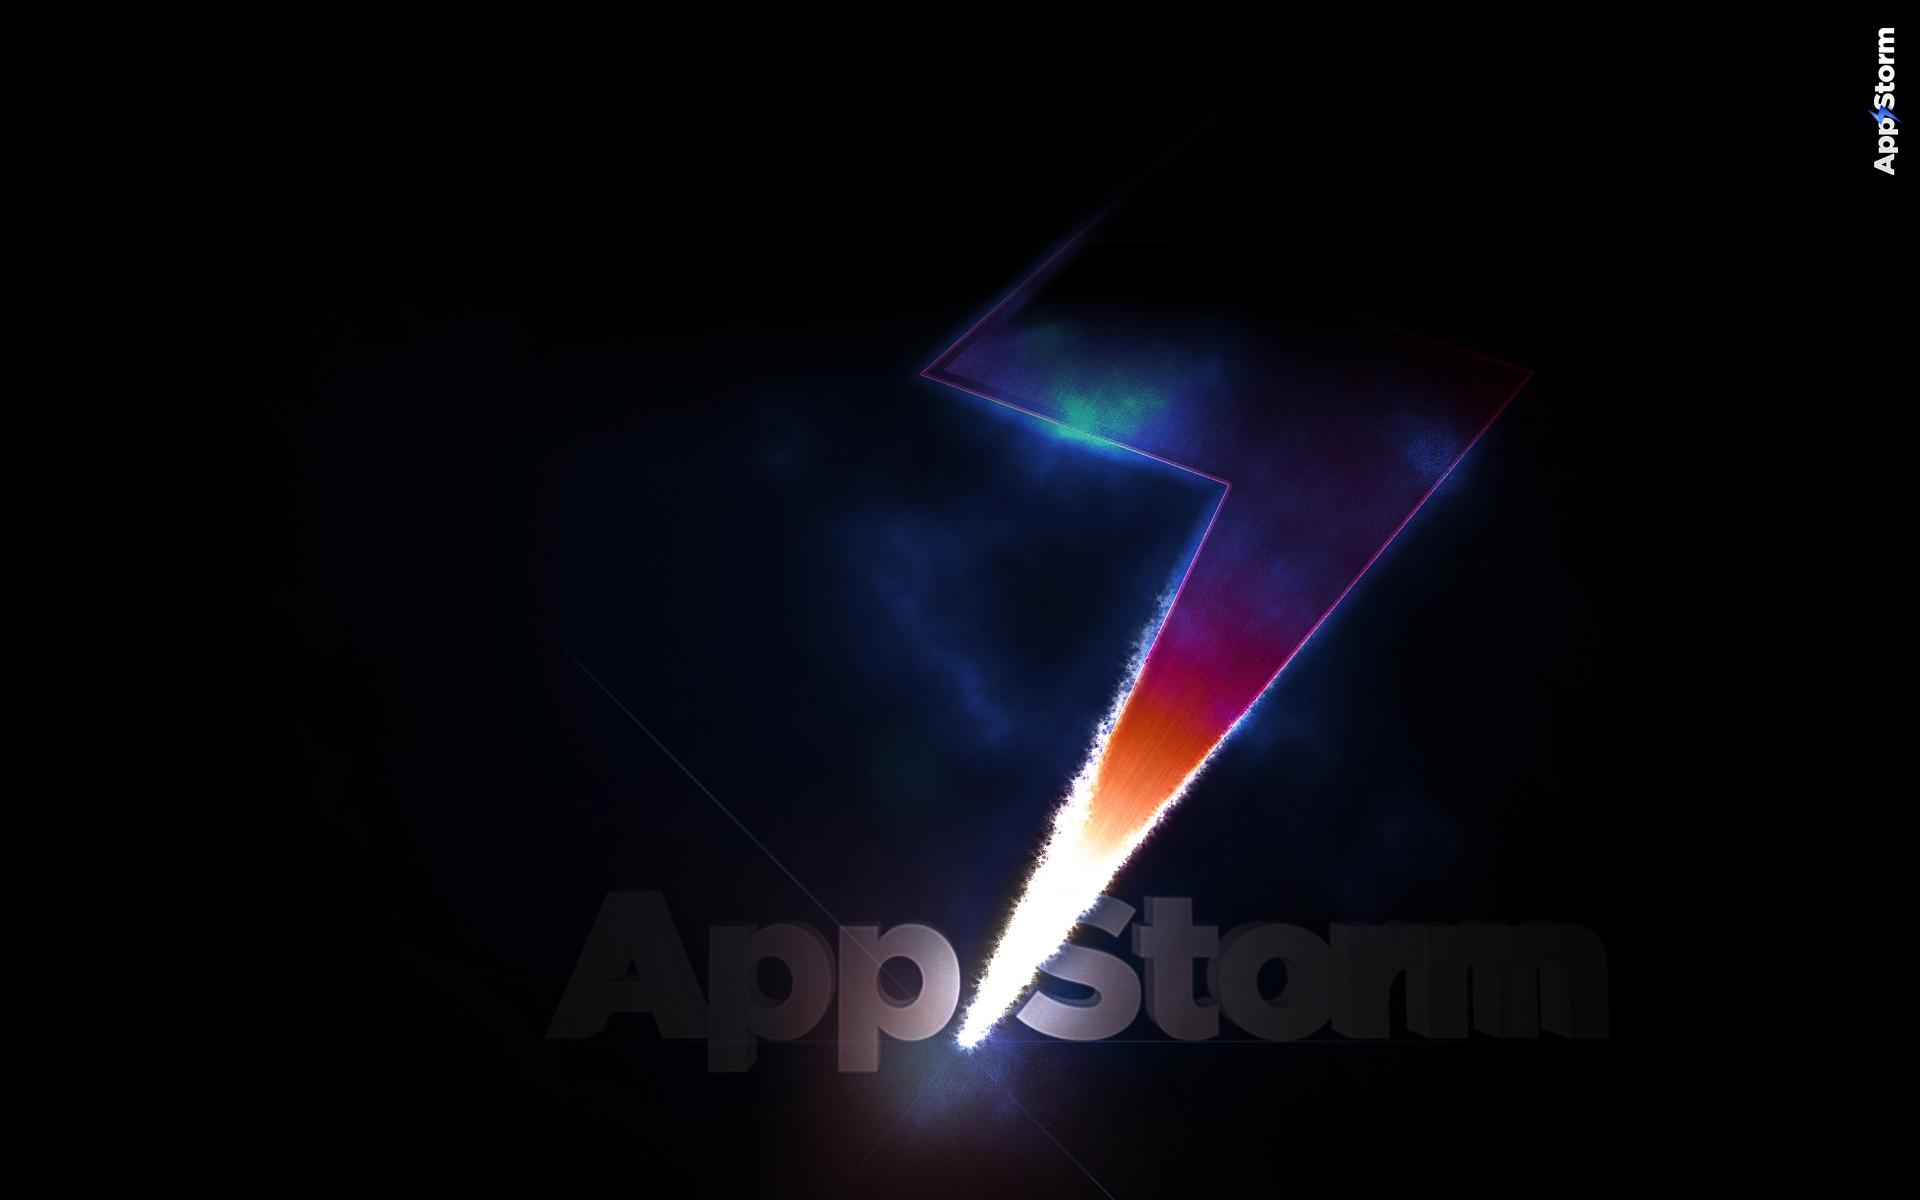 Dark Red Shadow Blue Laser Light Apple Darkness Mac Graphics Computer  Wallpaper Special Effects App Storm